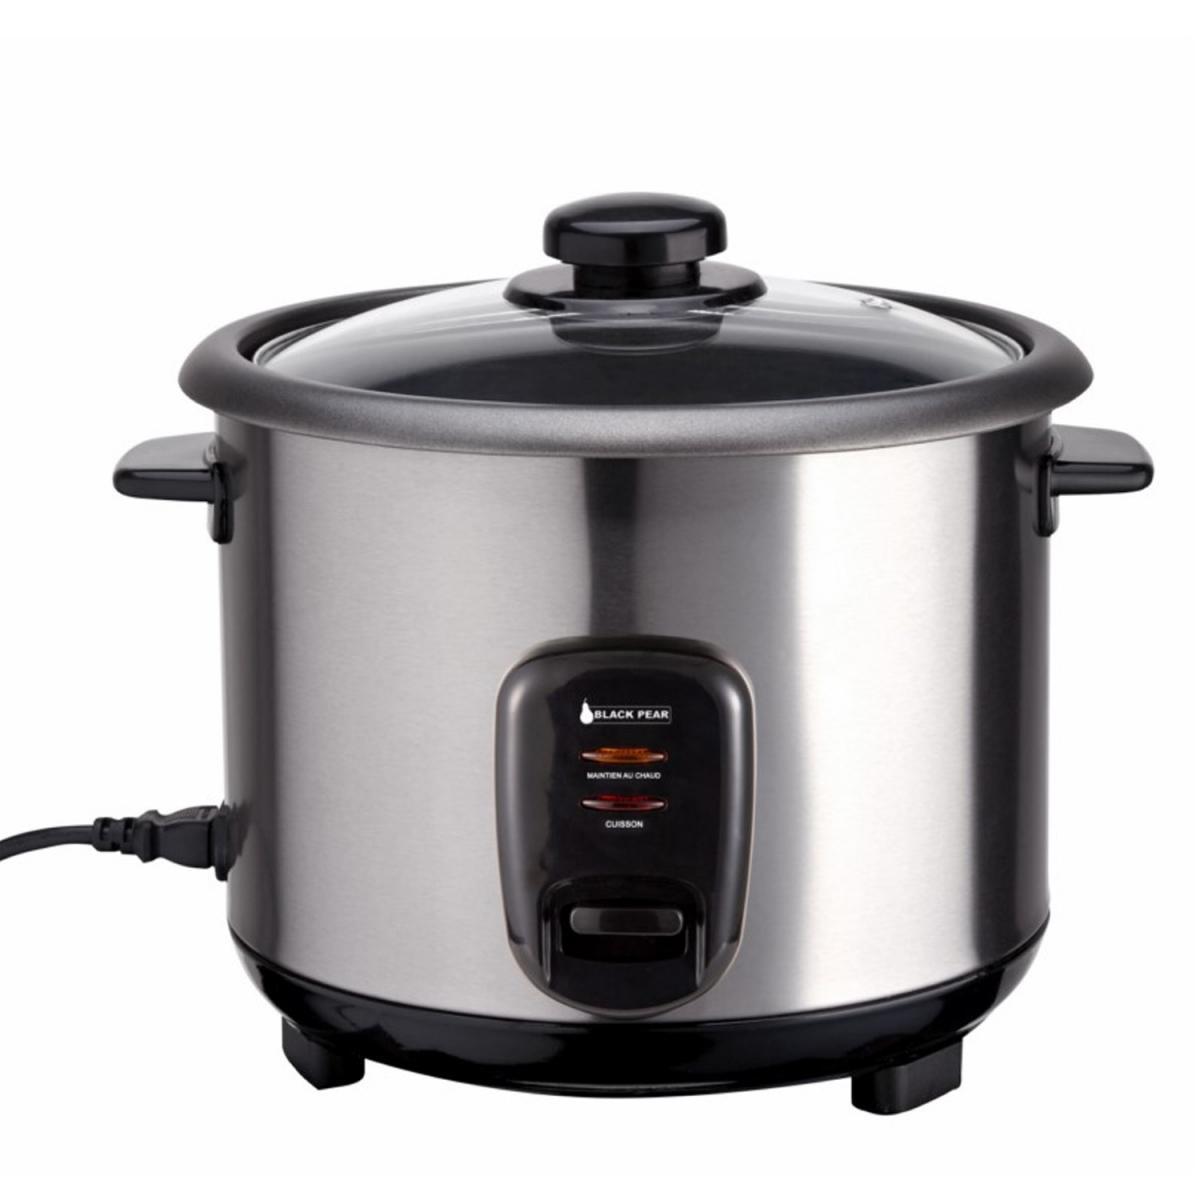 Blackpear Cuiseur à riz BRK 110 Blackpear - Capacité 1L + Spatule + Verre doseur